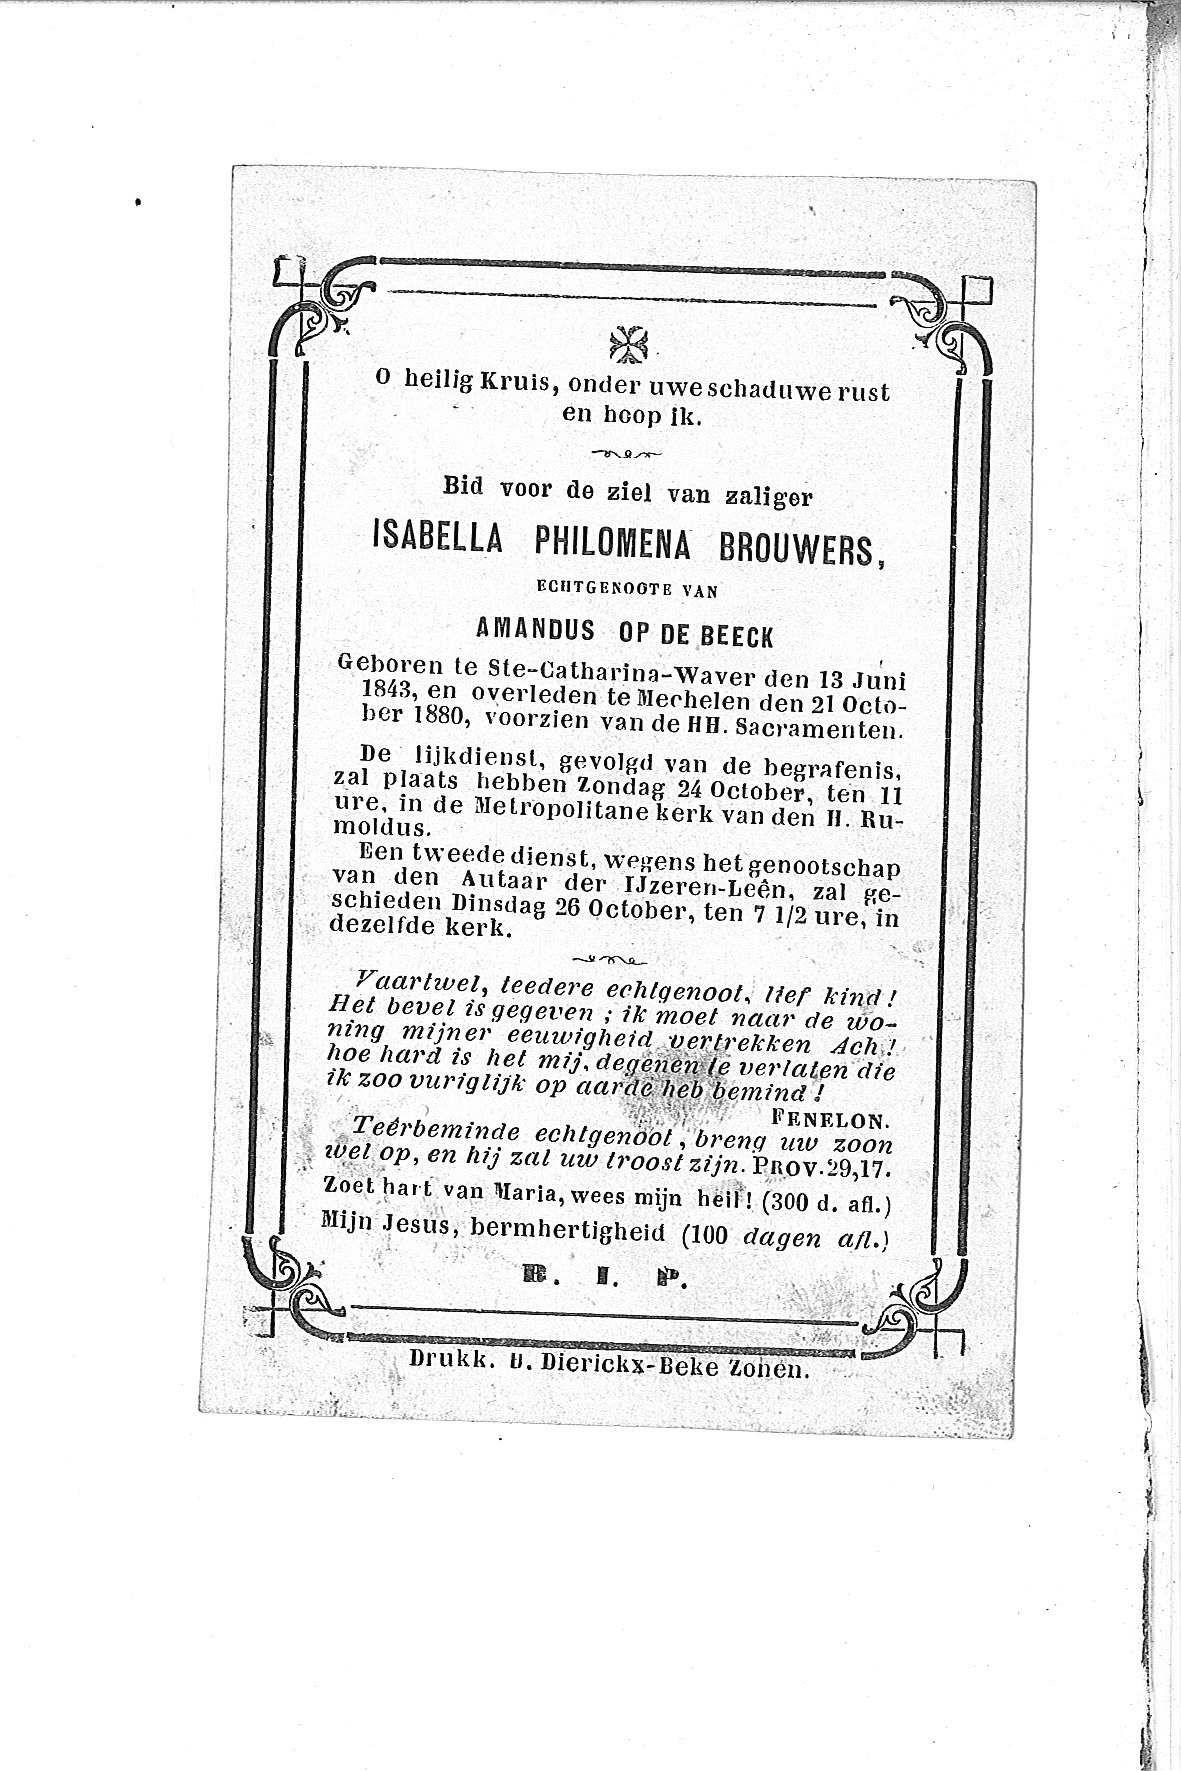 Isabella Philomena (1880) 20110805165022_00064.jpg